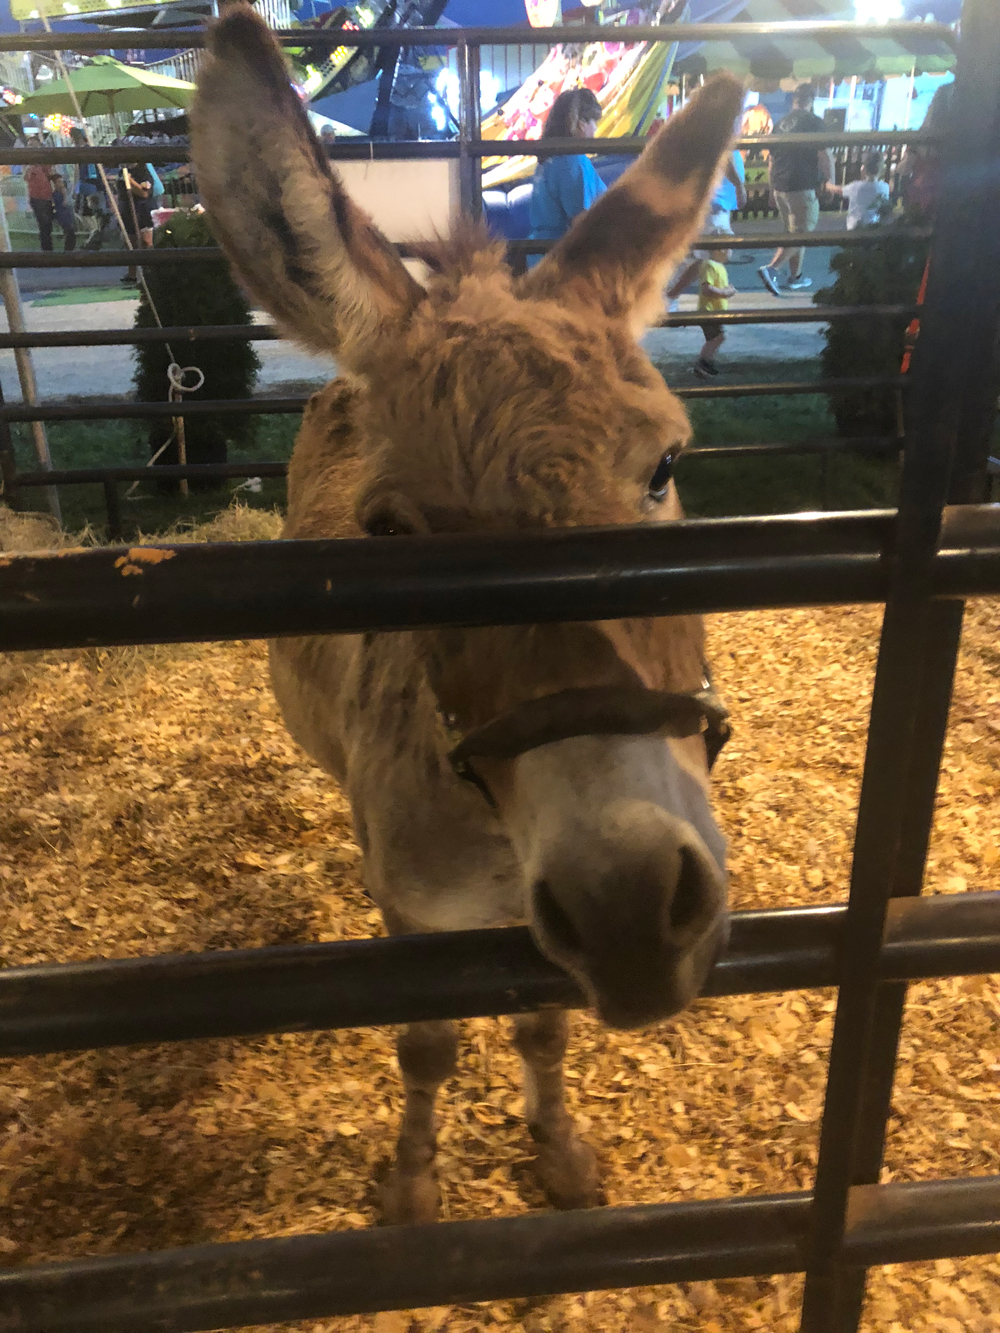 union-fair-all-american-petting-zoo-donkey-2